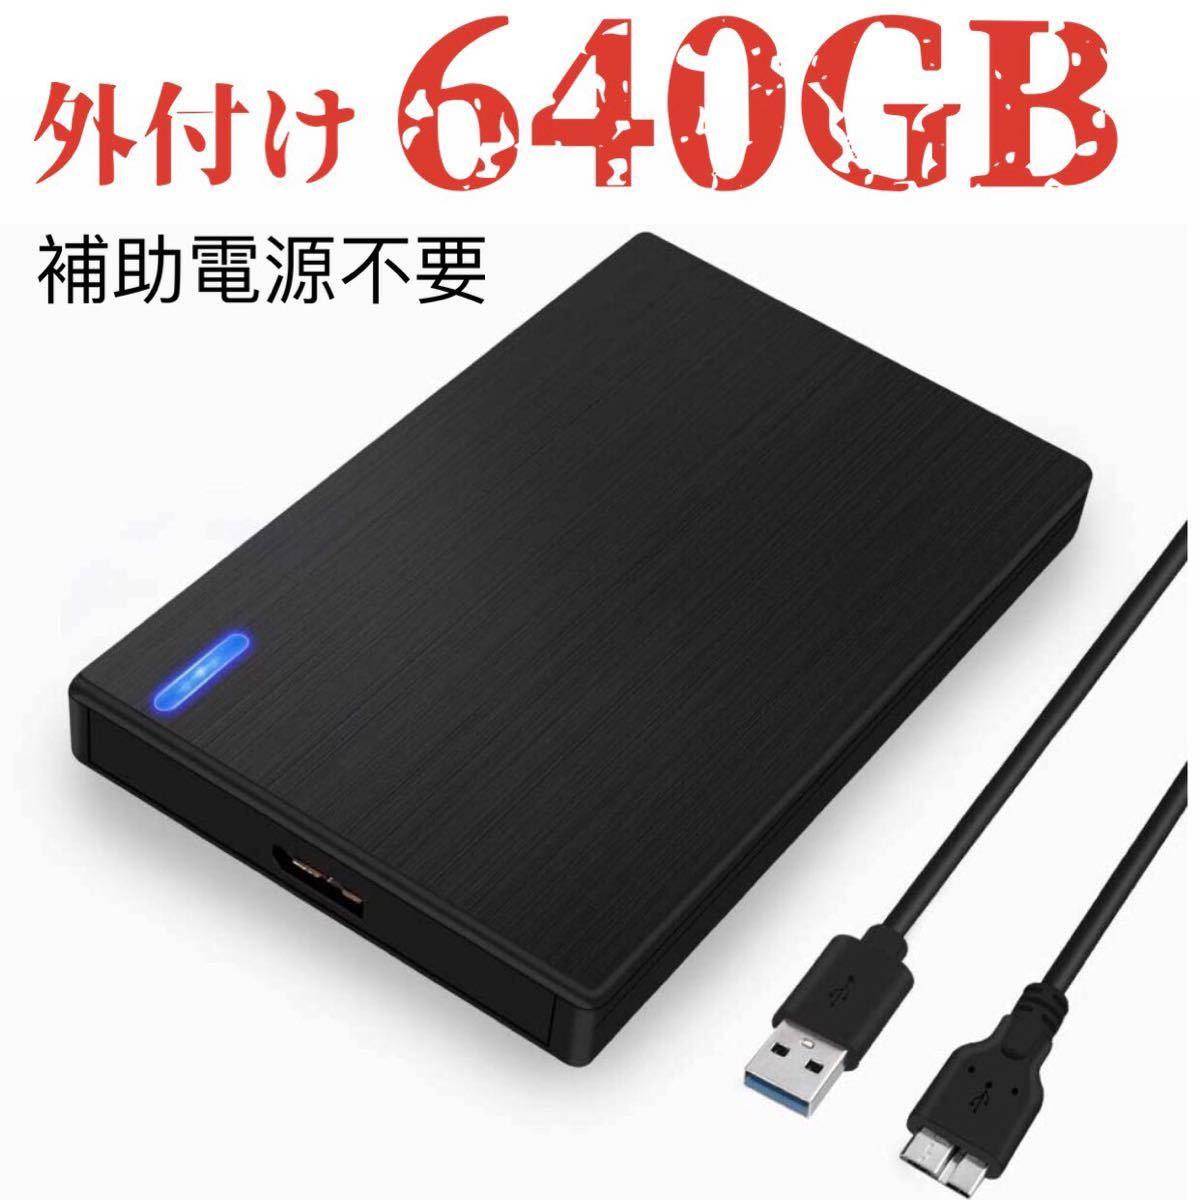 USB3.0 小型 外付ポータブルハードディスク 外付けHDD 640GB  補助電源不要